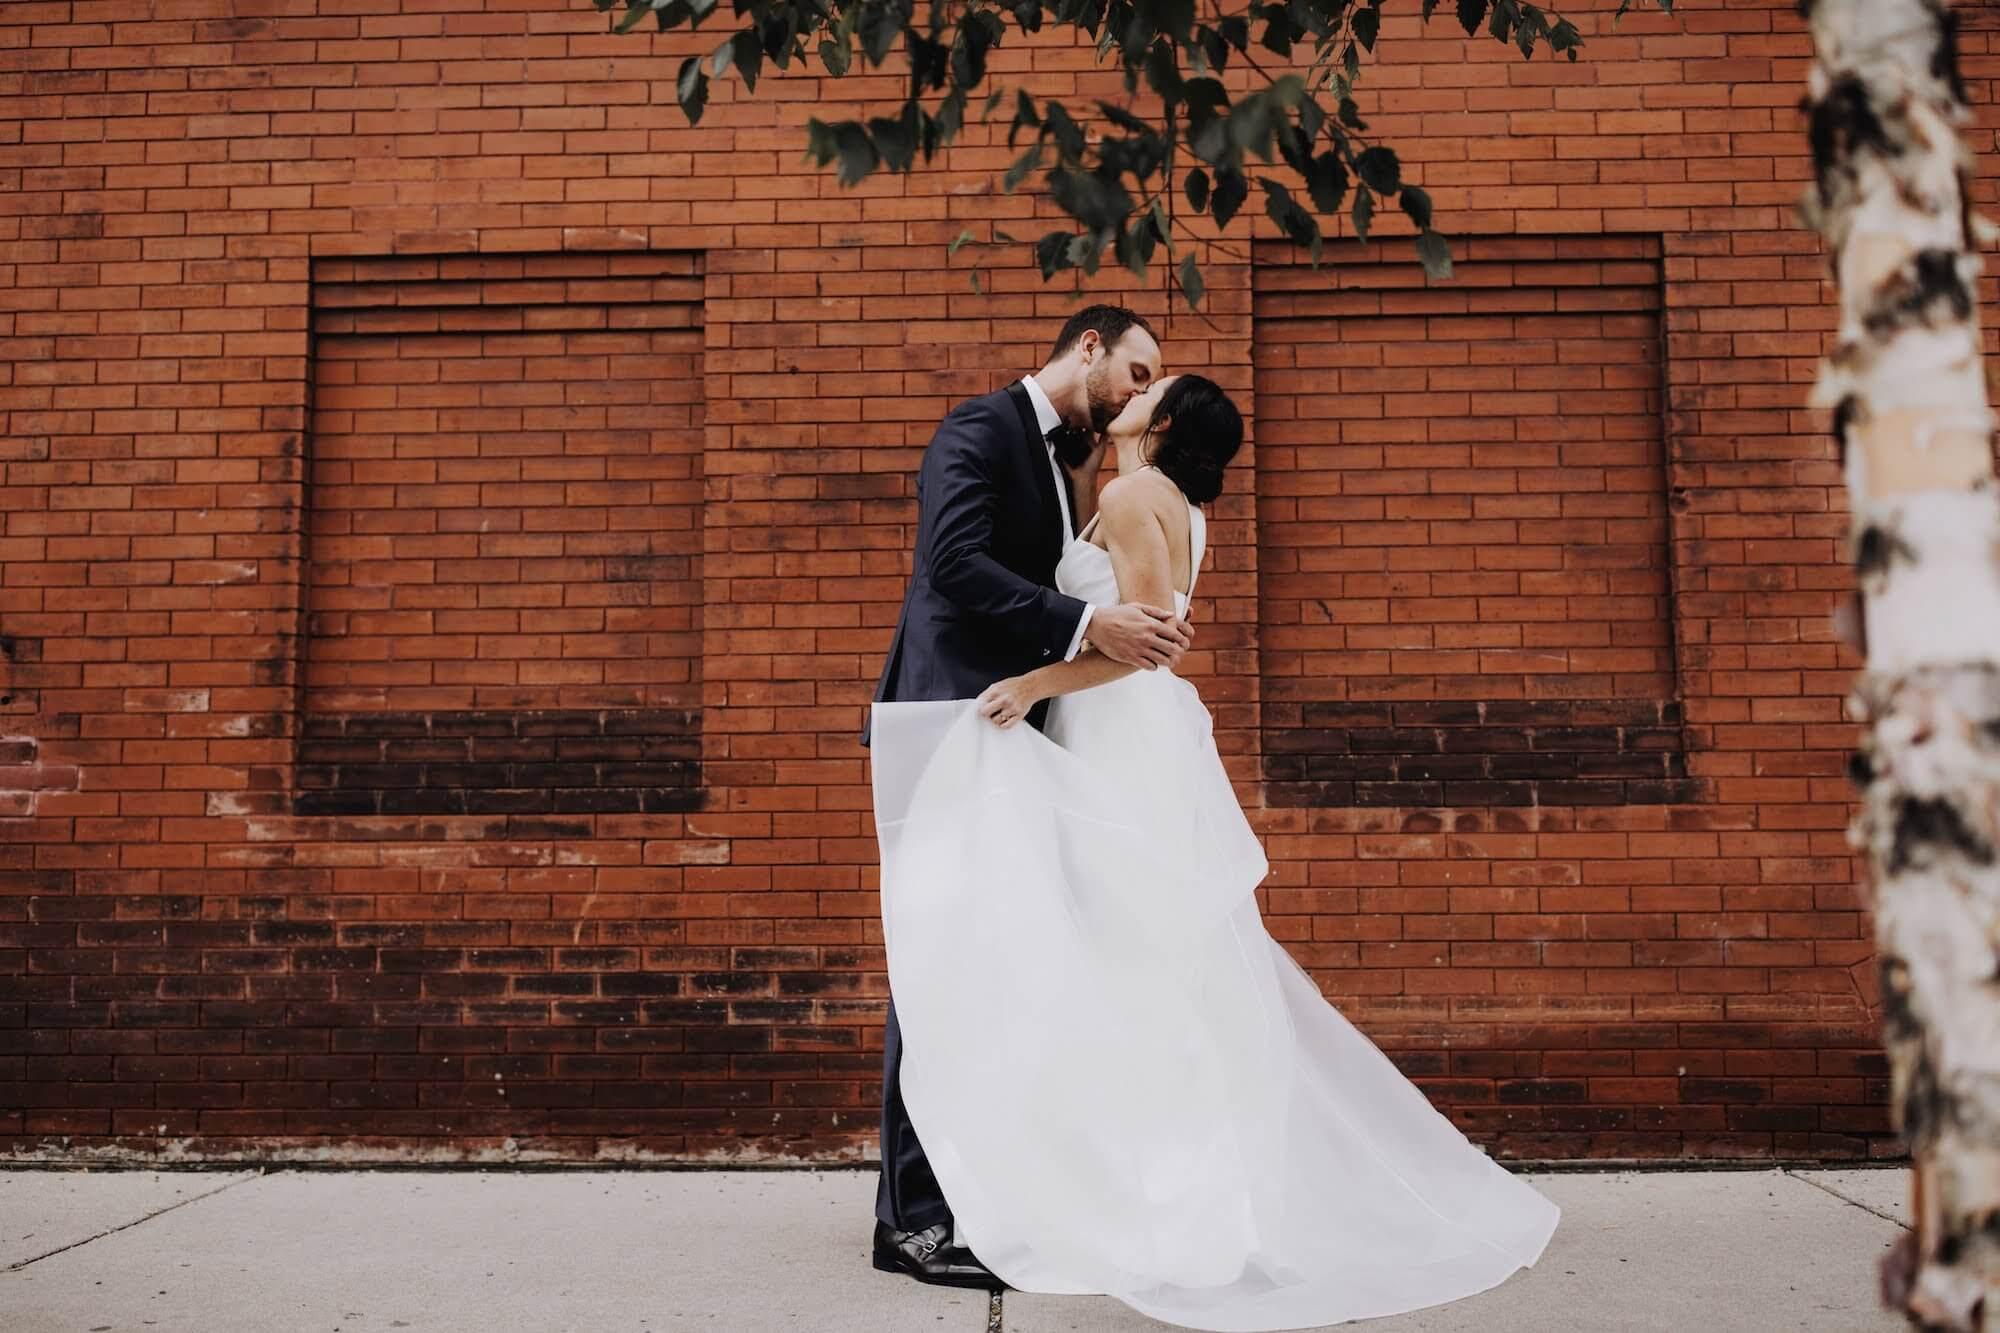 engle-olson-video-matt-lien-photography-rita-evan-wedding-10.jpg